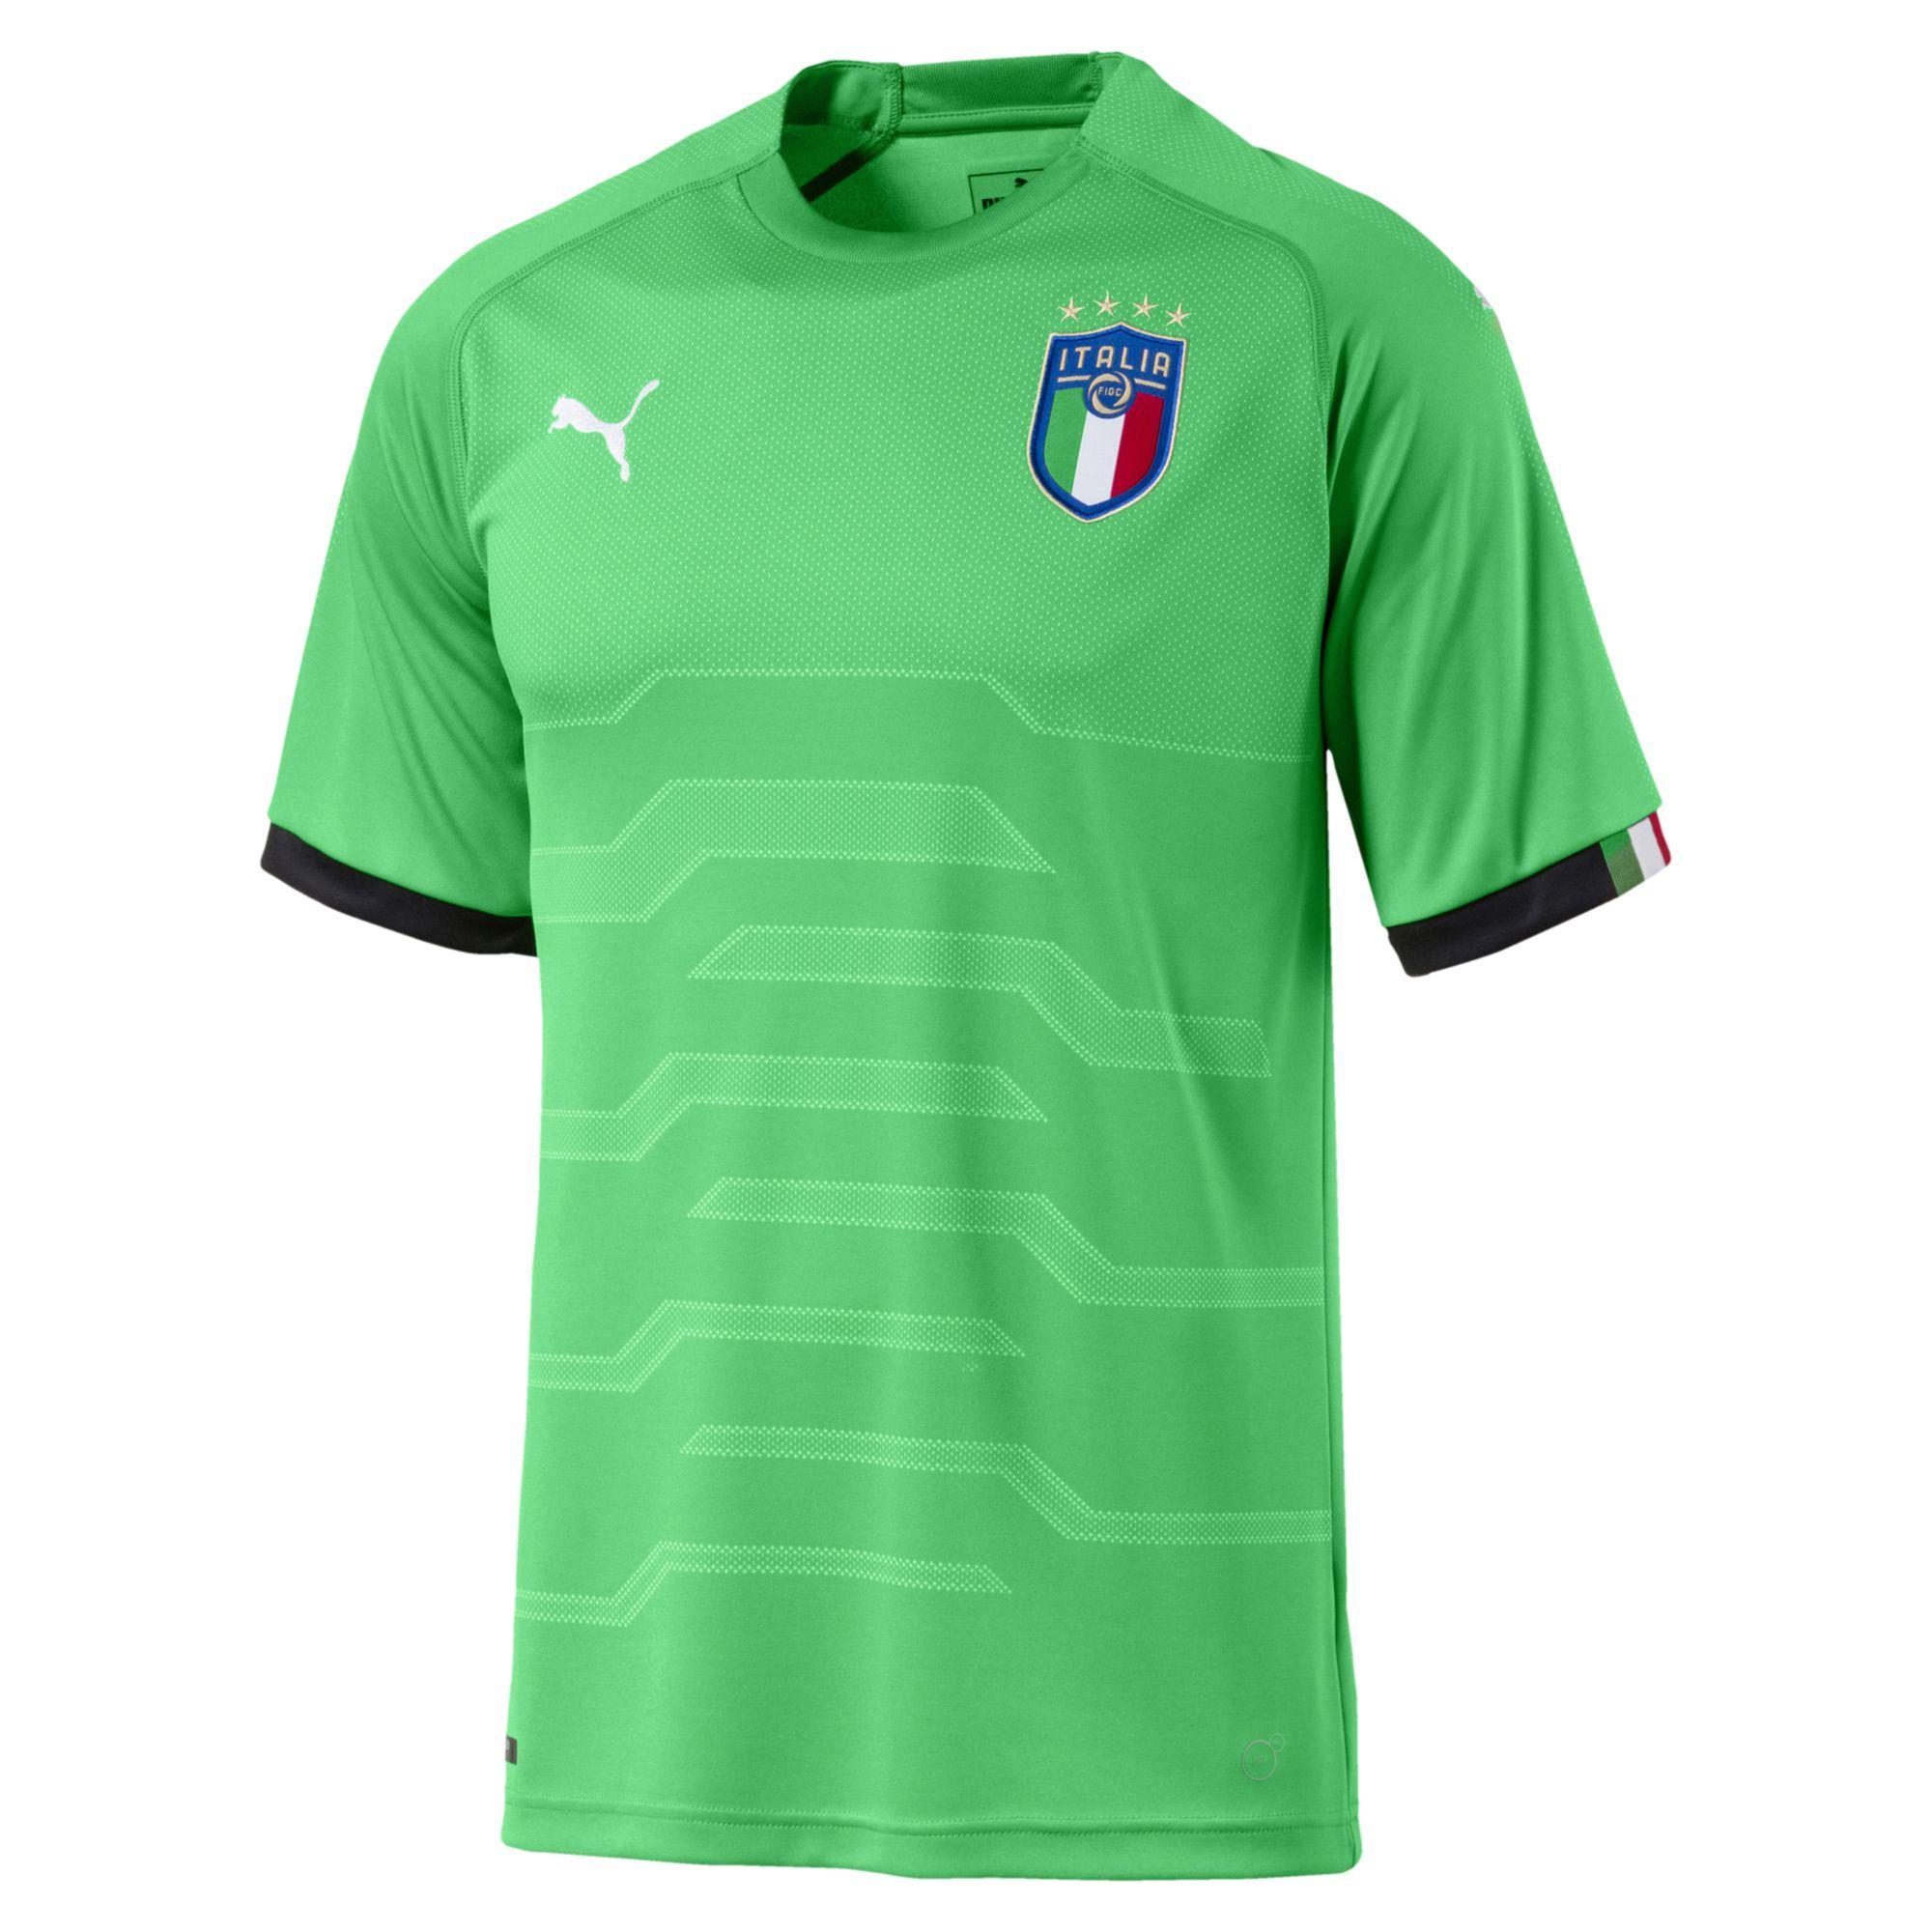 Figc Italia Goalkeeper Shirt Replica Ss